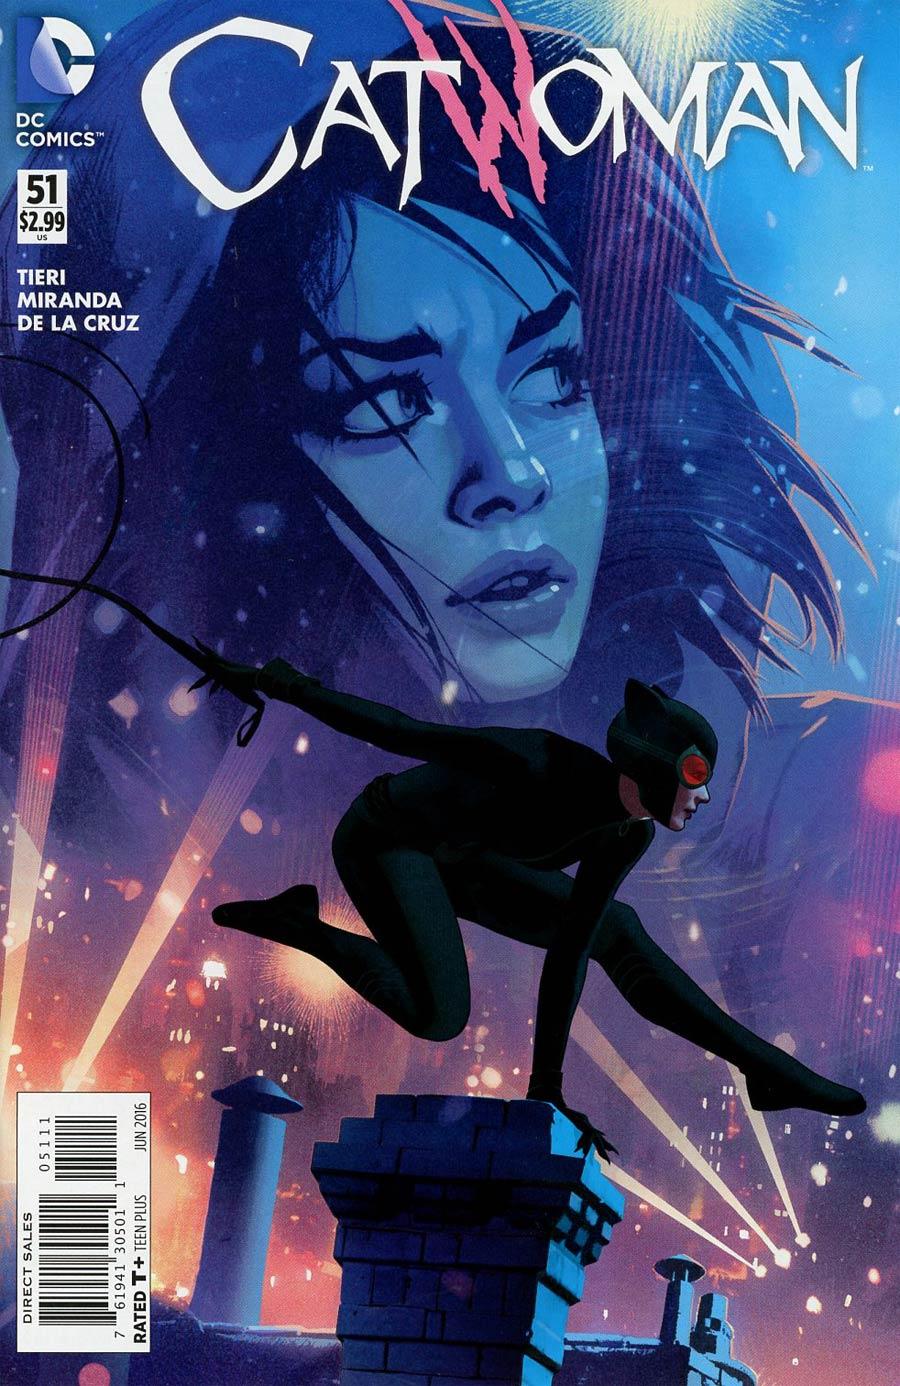 Catwoman Vol 4 #51